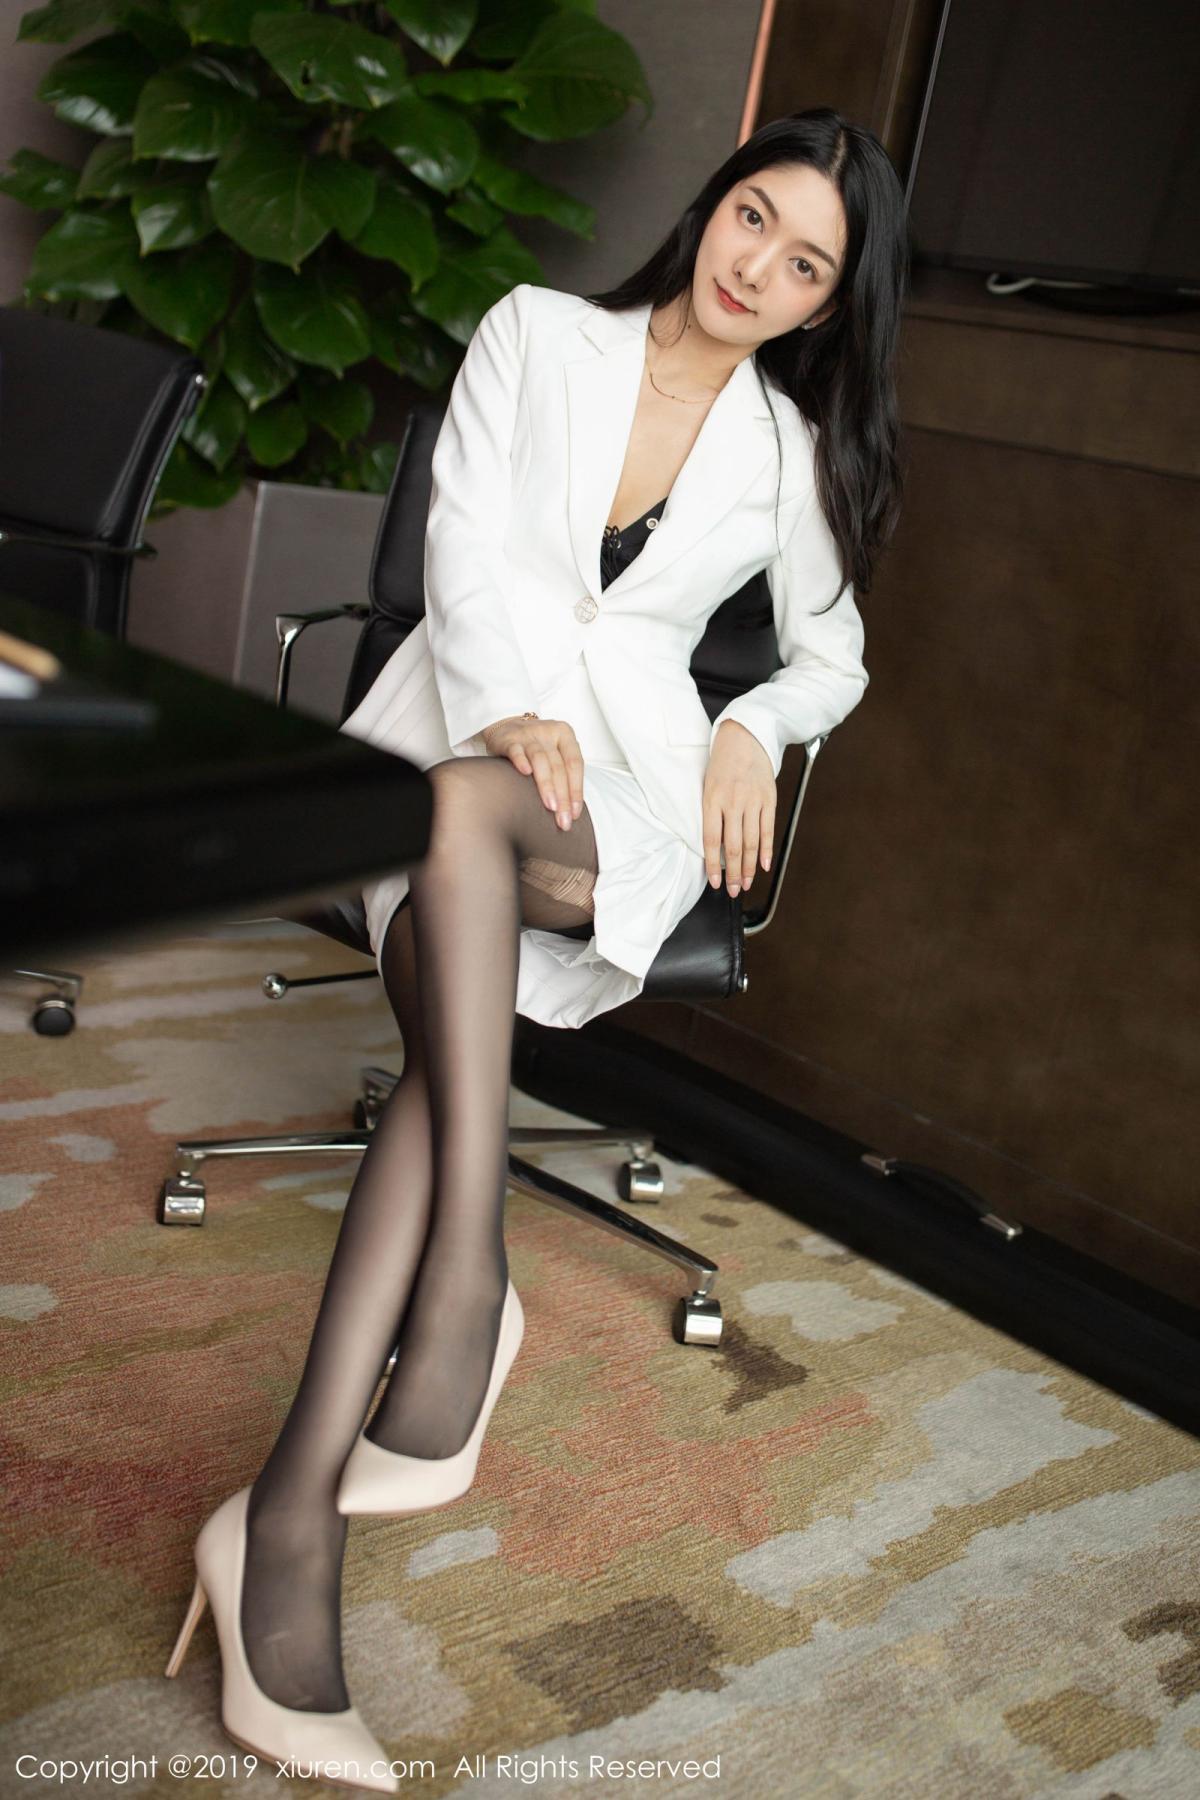 [XiuRen] Vol.1821 Come to my room and sit after you get off work 9P, Black Silk, Di Yi, Xiuren